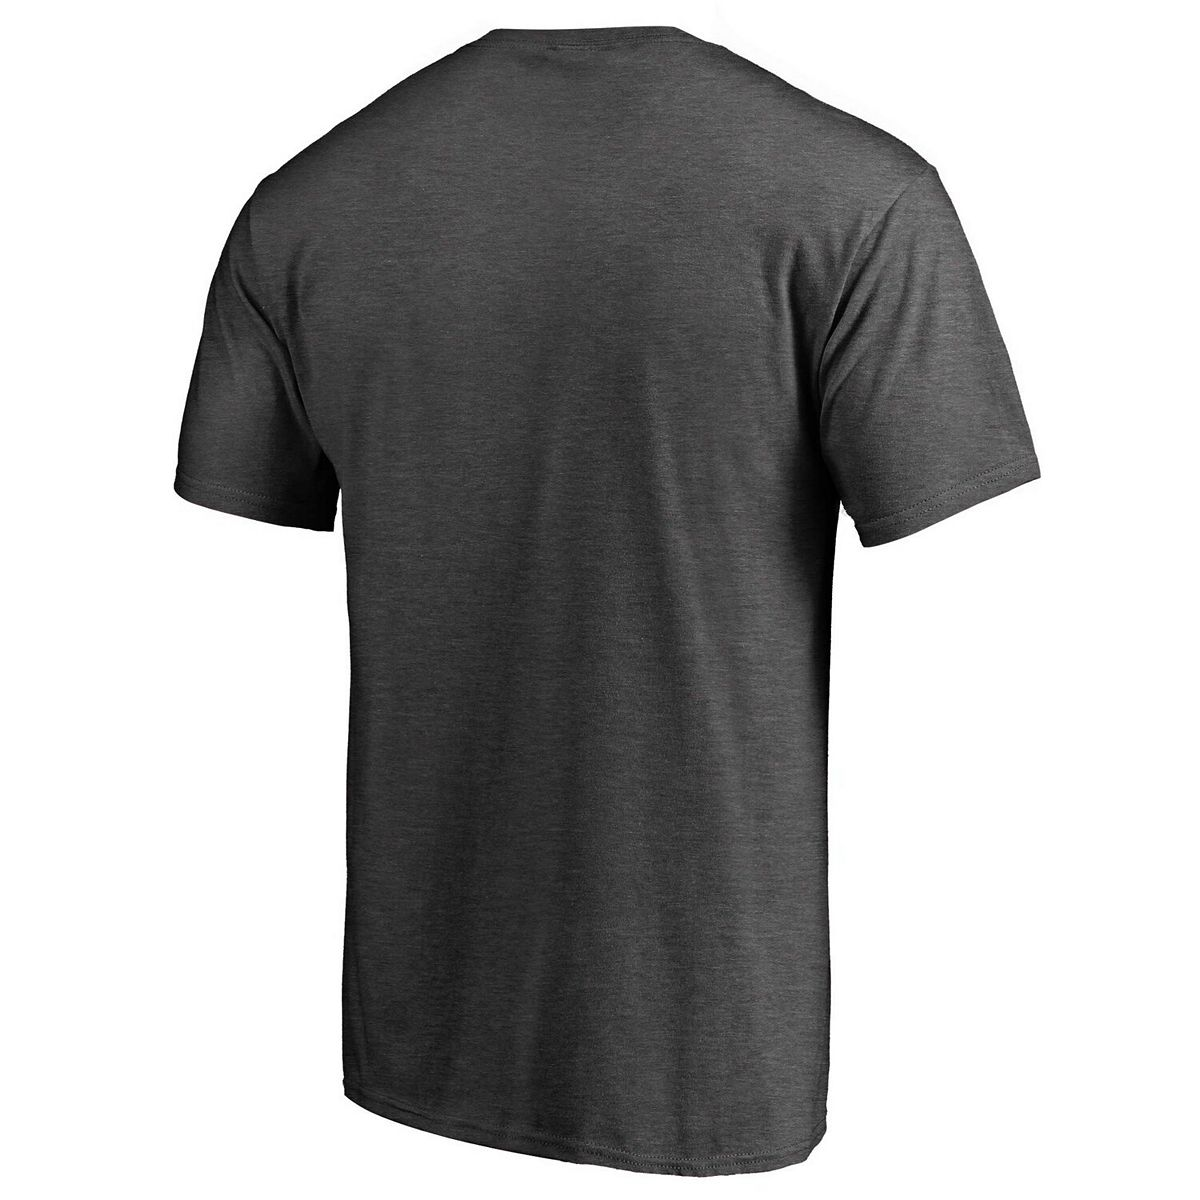 Men's Fanatics Branded Heathered Charcoal Los Angeles Dodgers Win Stripe T-Shirt xKoyE